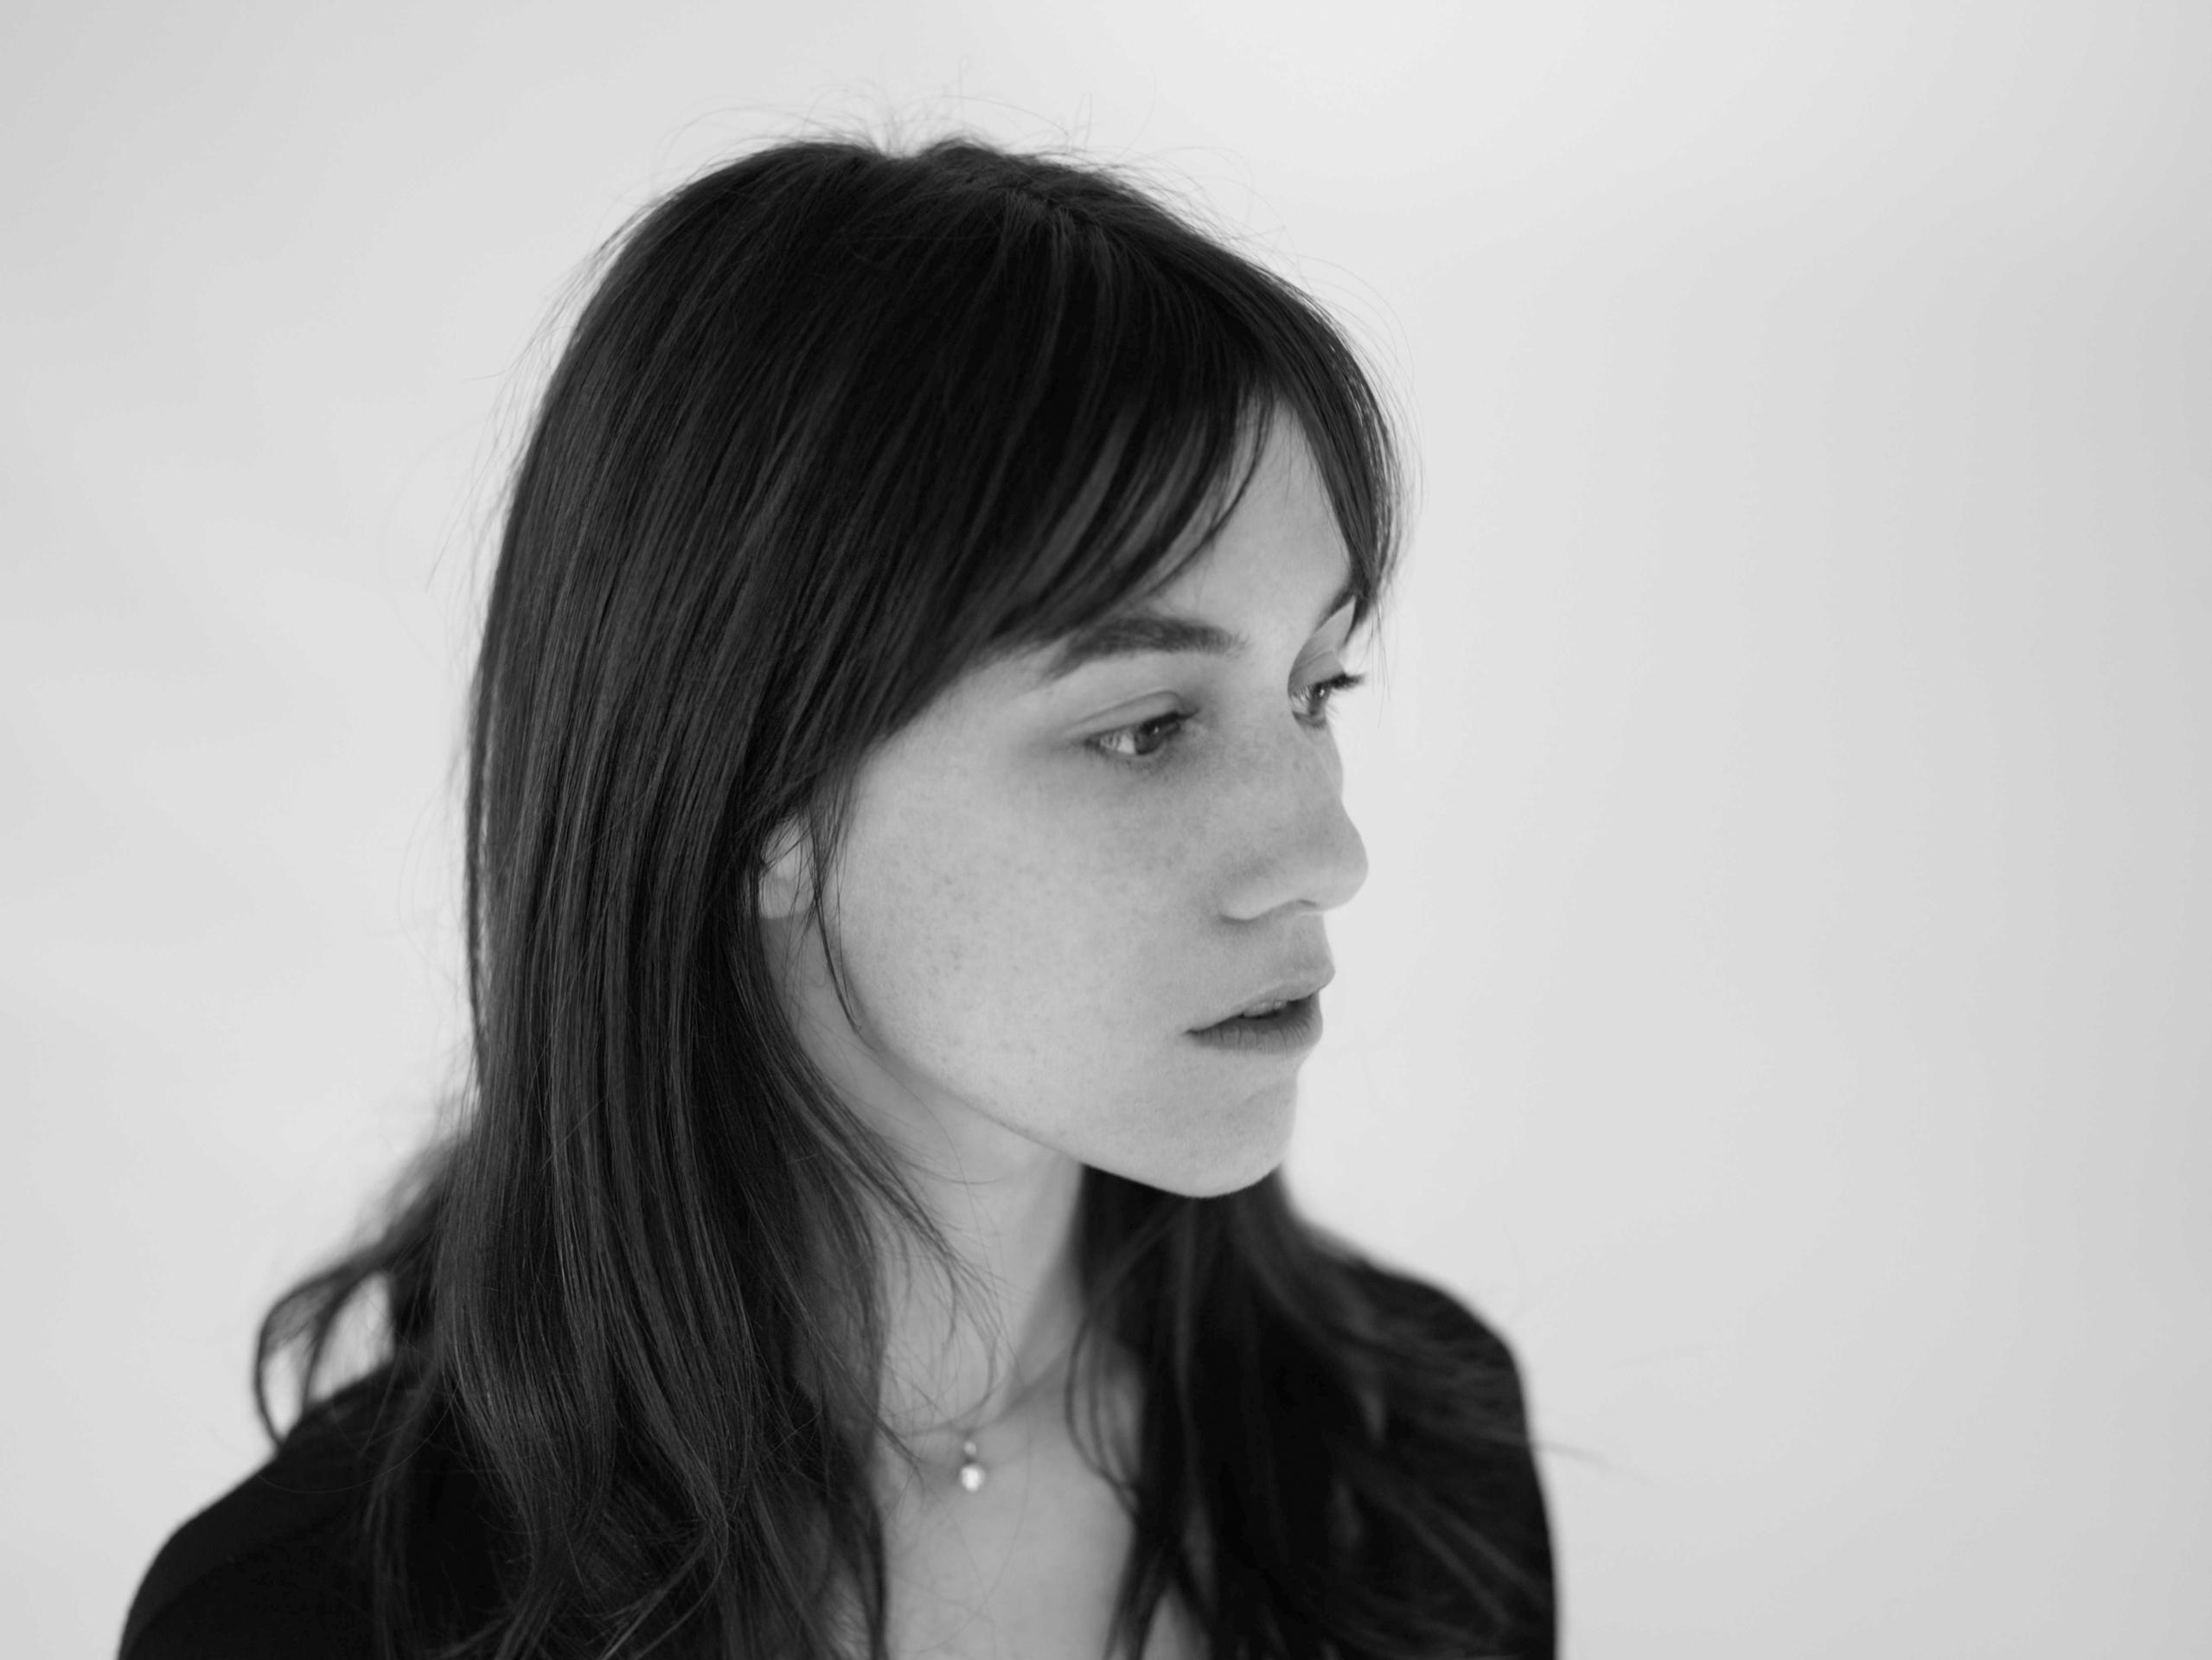 Charlotte Gainsbourg Hd Desktop